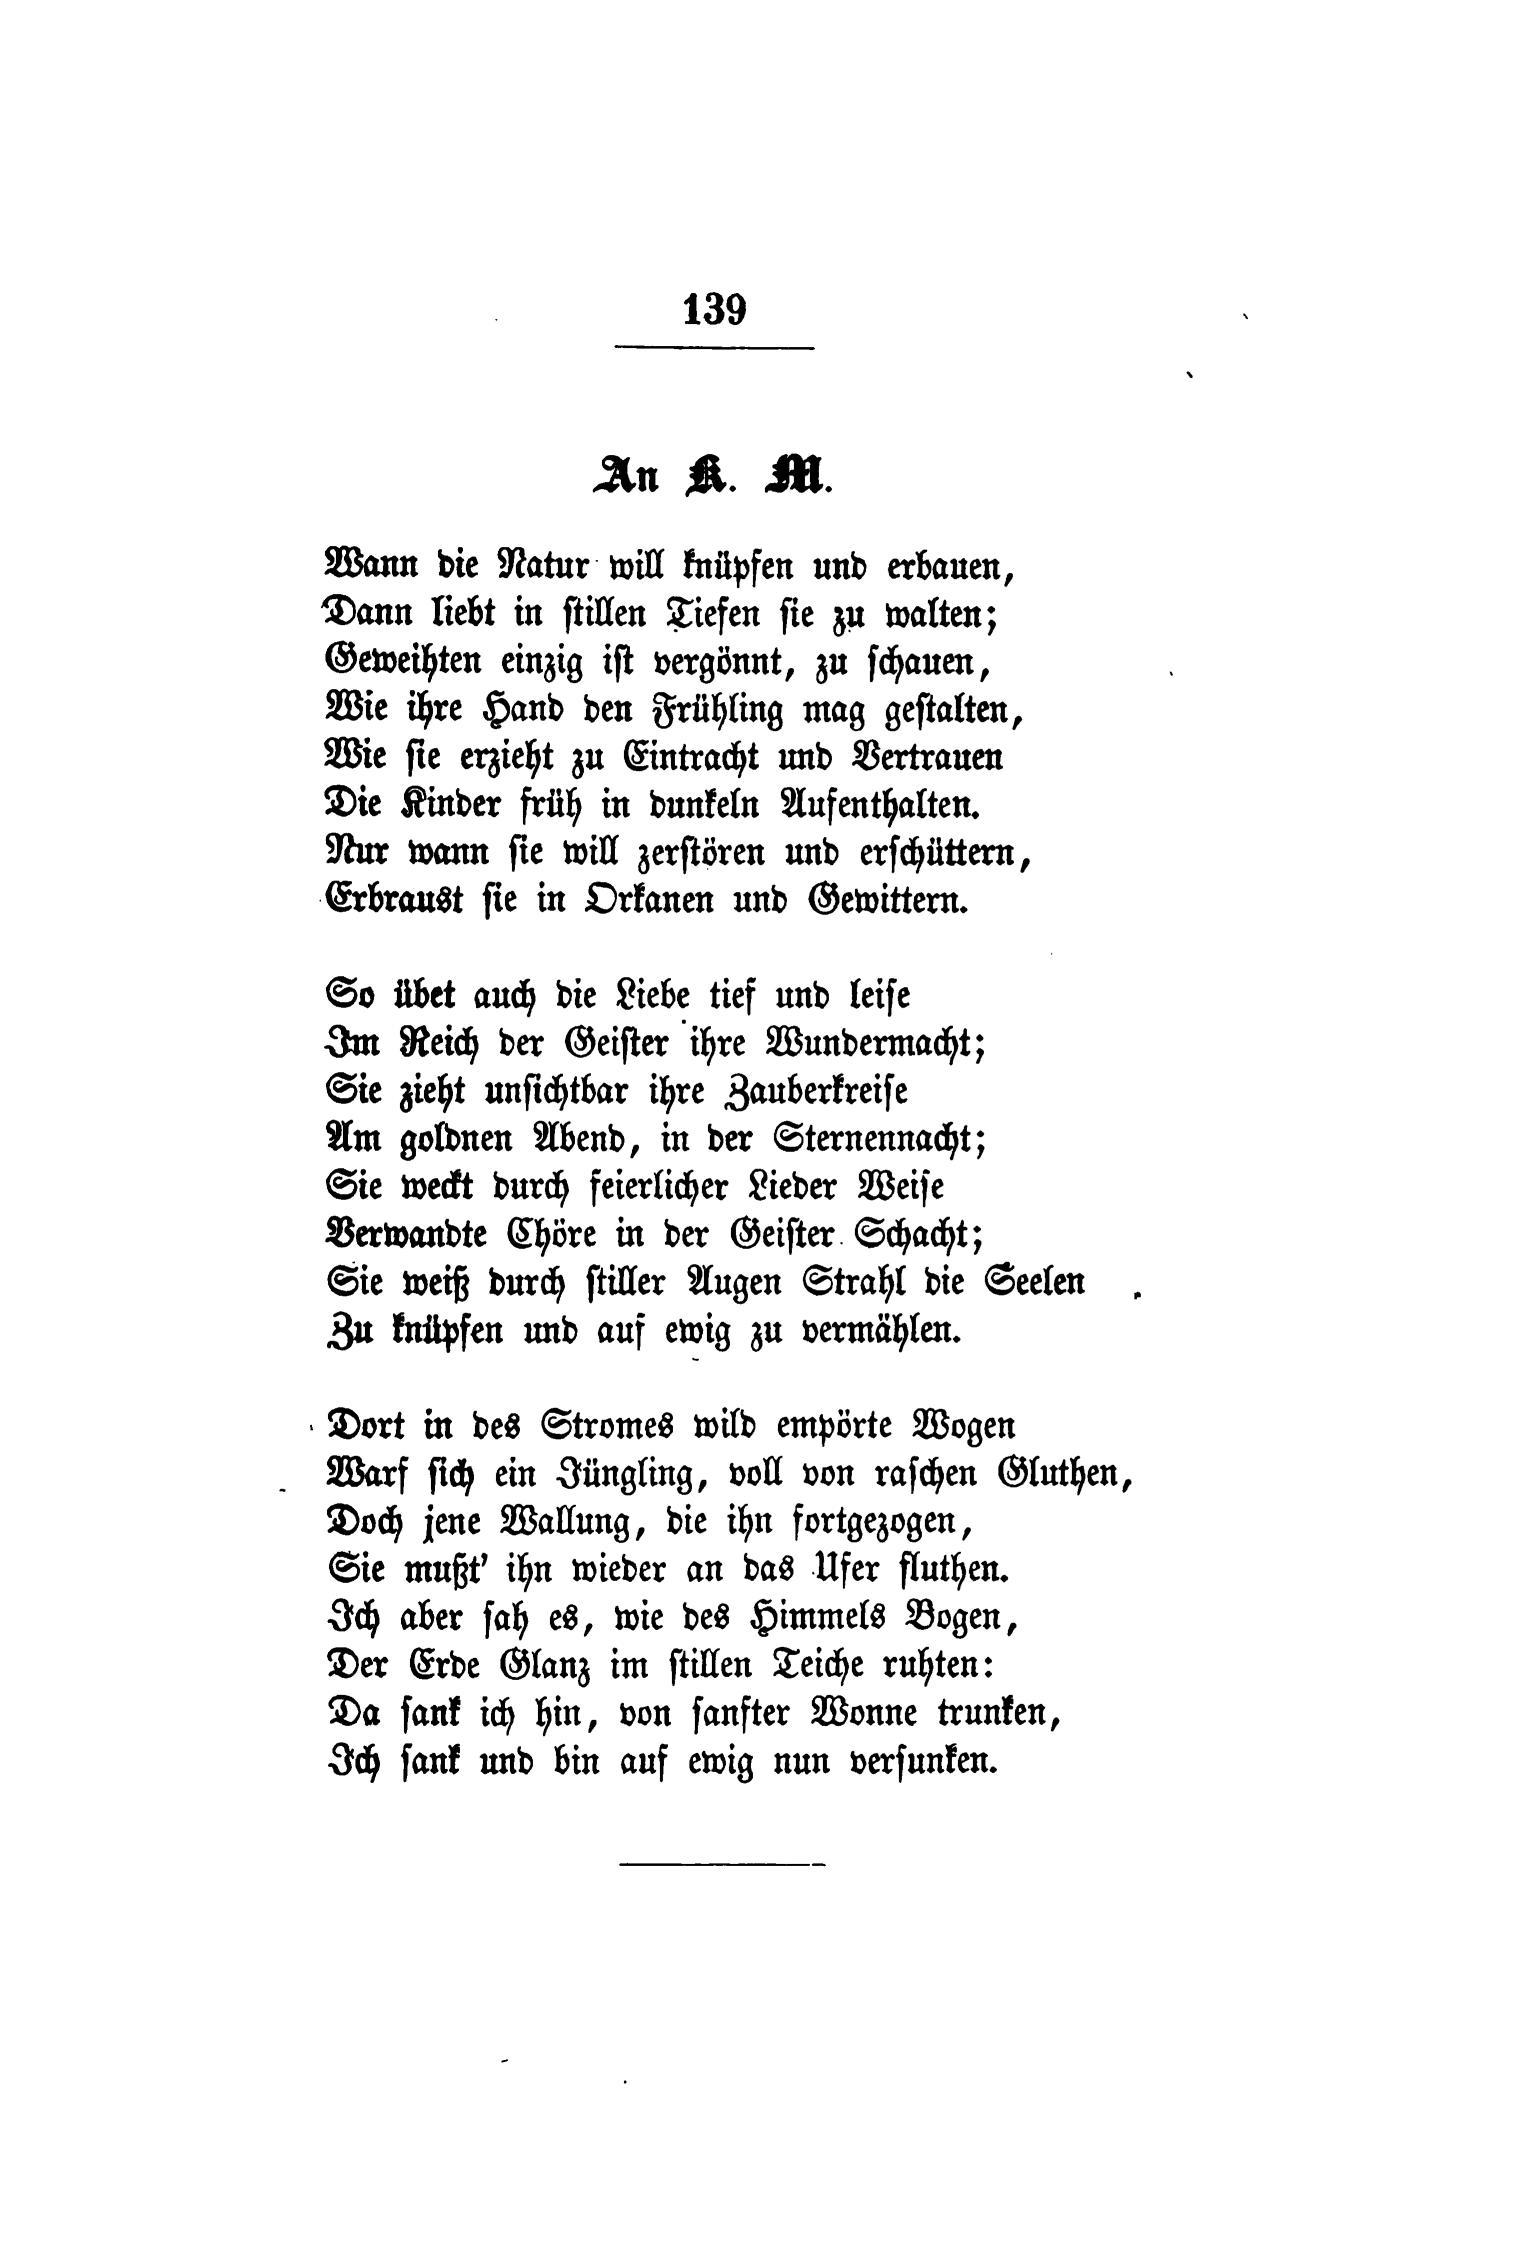 File:De Gedichte (Uhland) 159.jpg - Wikimedia Commons